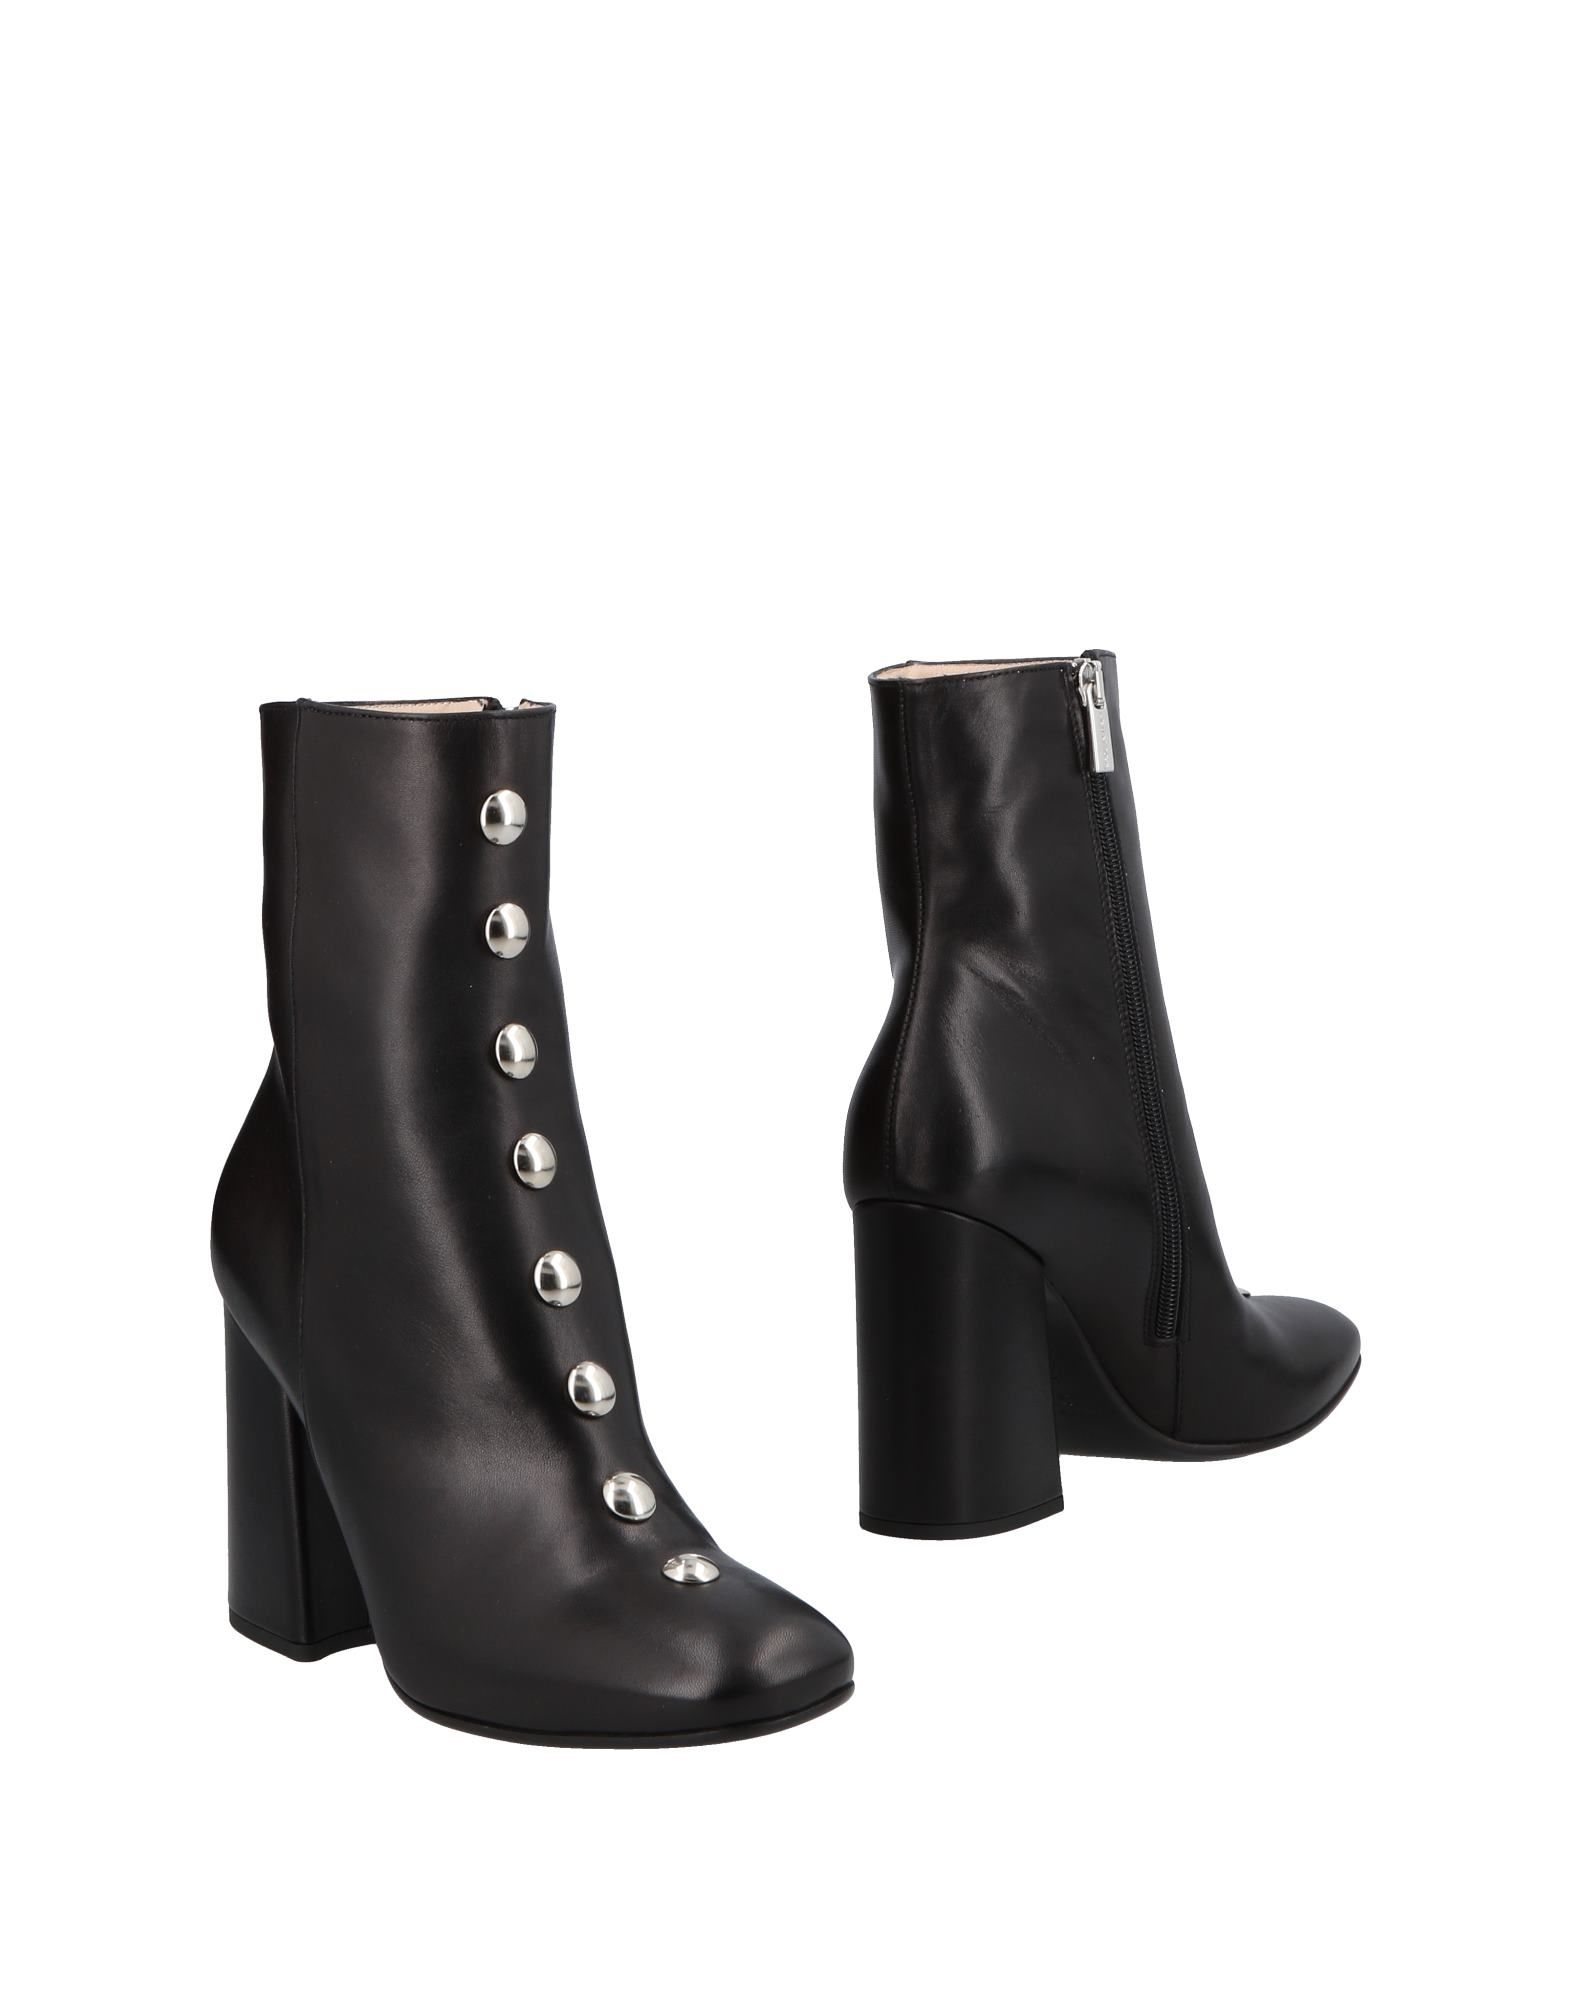 MARIE ELODIE Полусапоги и высокие ботинки ботильоны marie collet marie collet ma144awxcf53